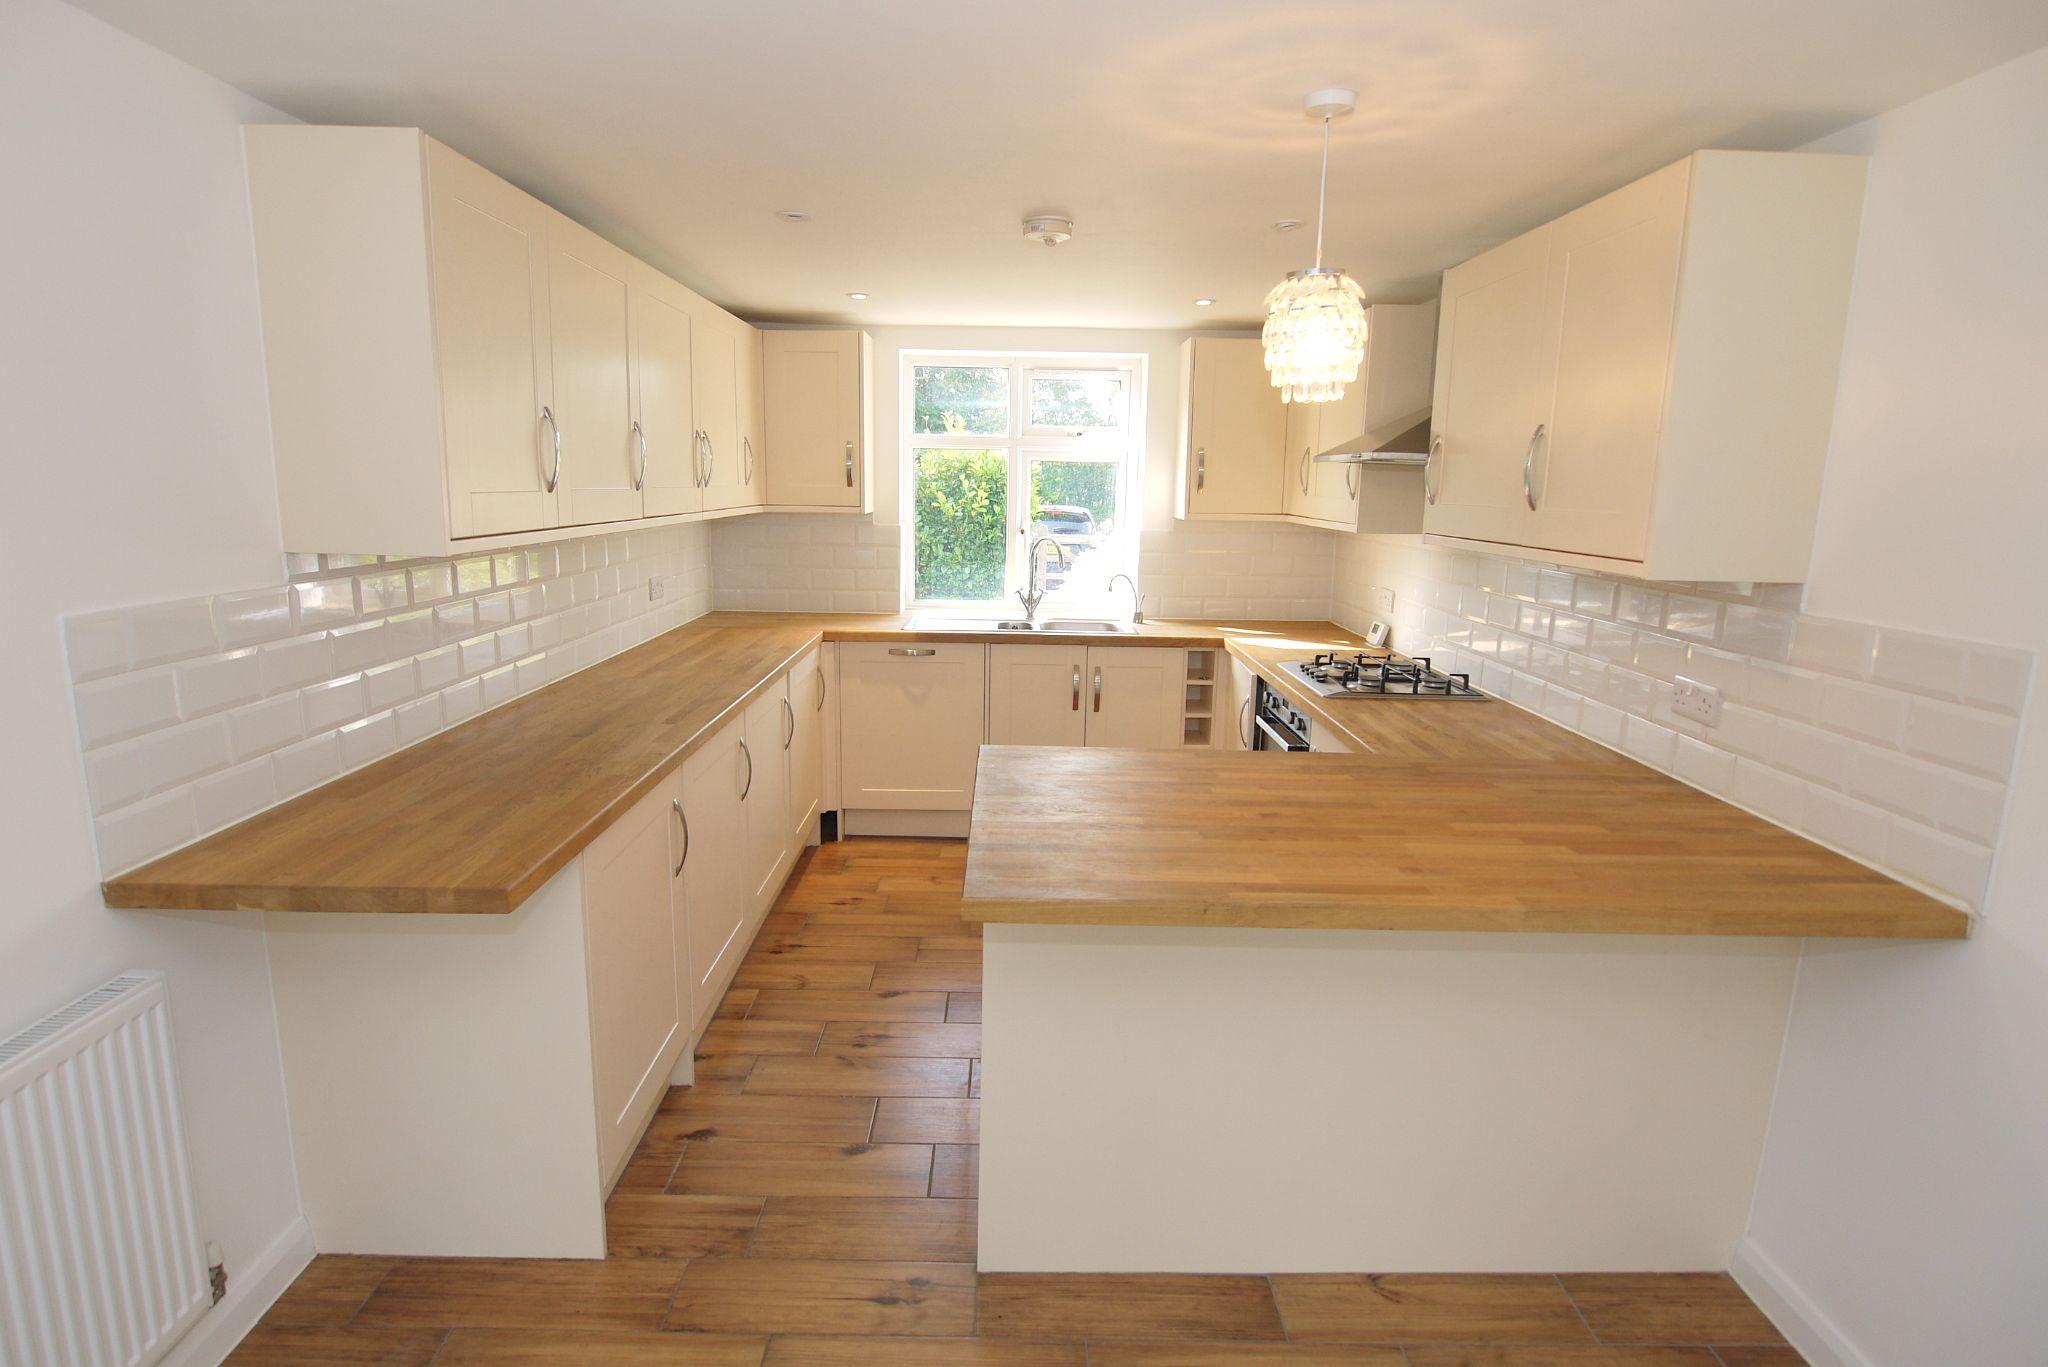 3 bedroom detached house Sold in Sevenoaks - Photograph 4